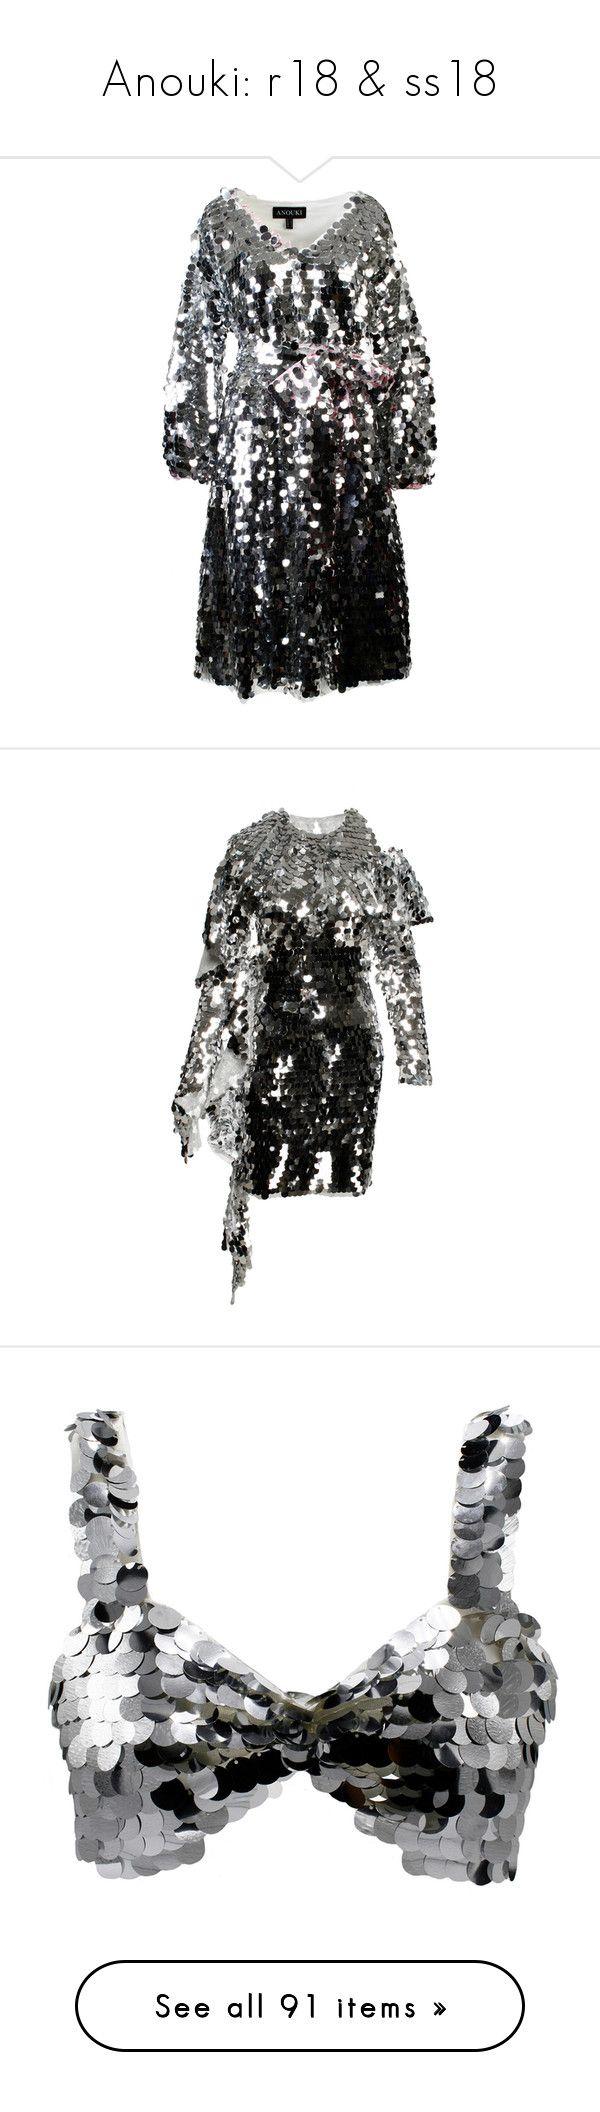 """Anouki: r18 & ss18"" by livnd ❤ liked on Polyvore featuring anouki, livndfashion, livndanouki, resort2018, dresses, silver, sequin embellished dress, silver v neck dress, silver sequin dress and v-neck dresses"